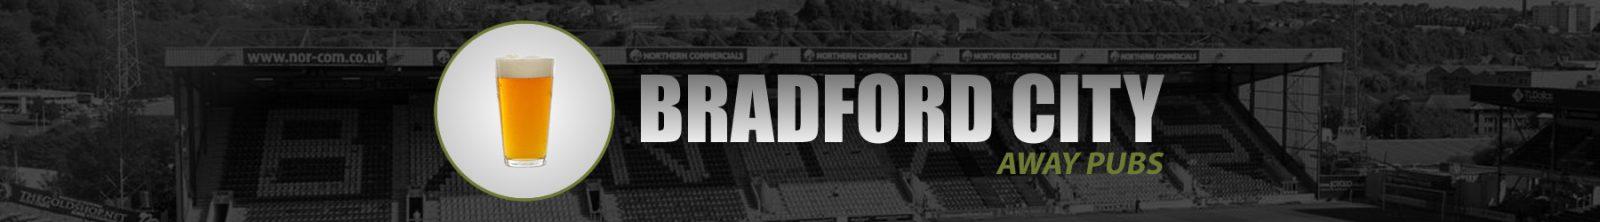 Bradford City Away Pubs